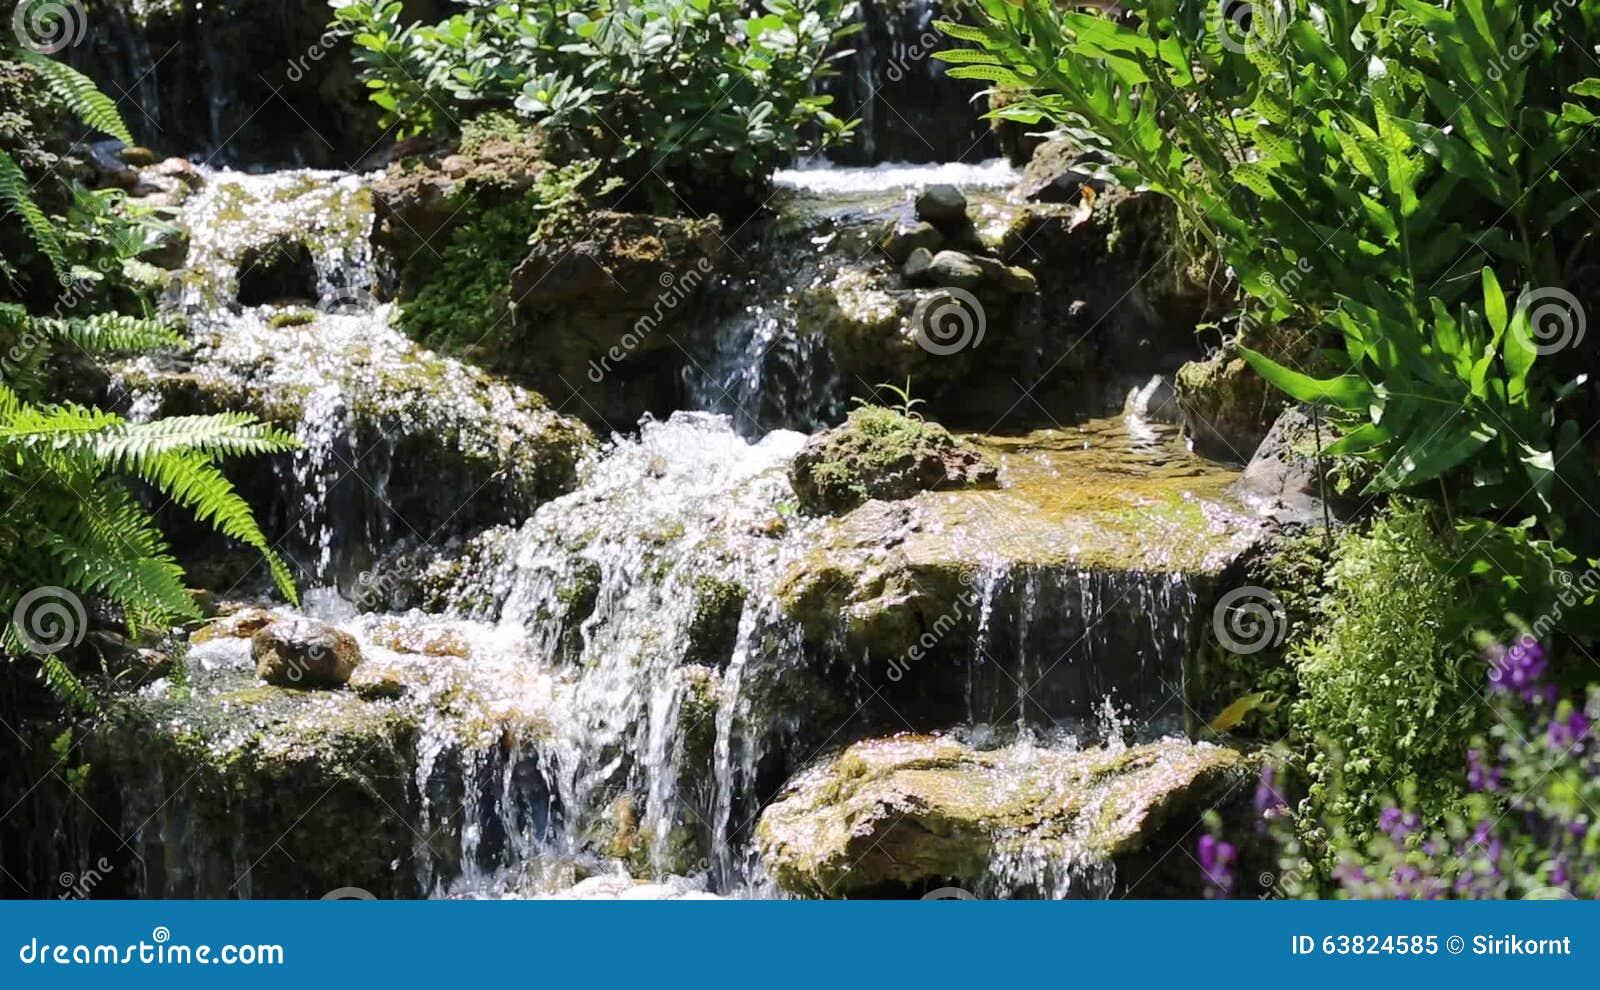 Waterval In Tuin : Waterval in tuin stock video video bestaande uit steen